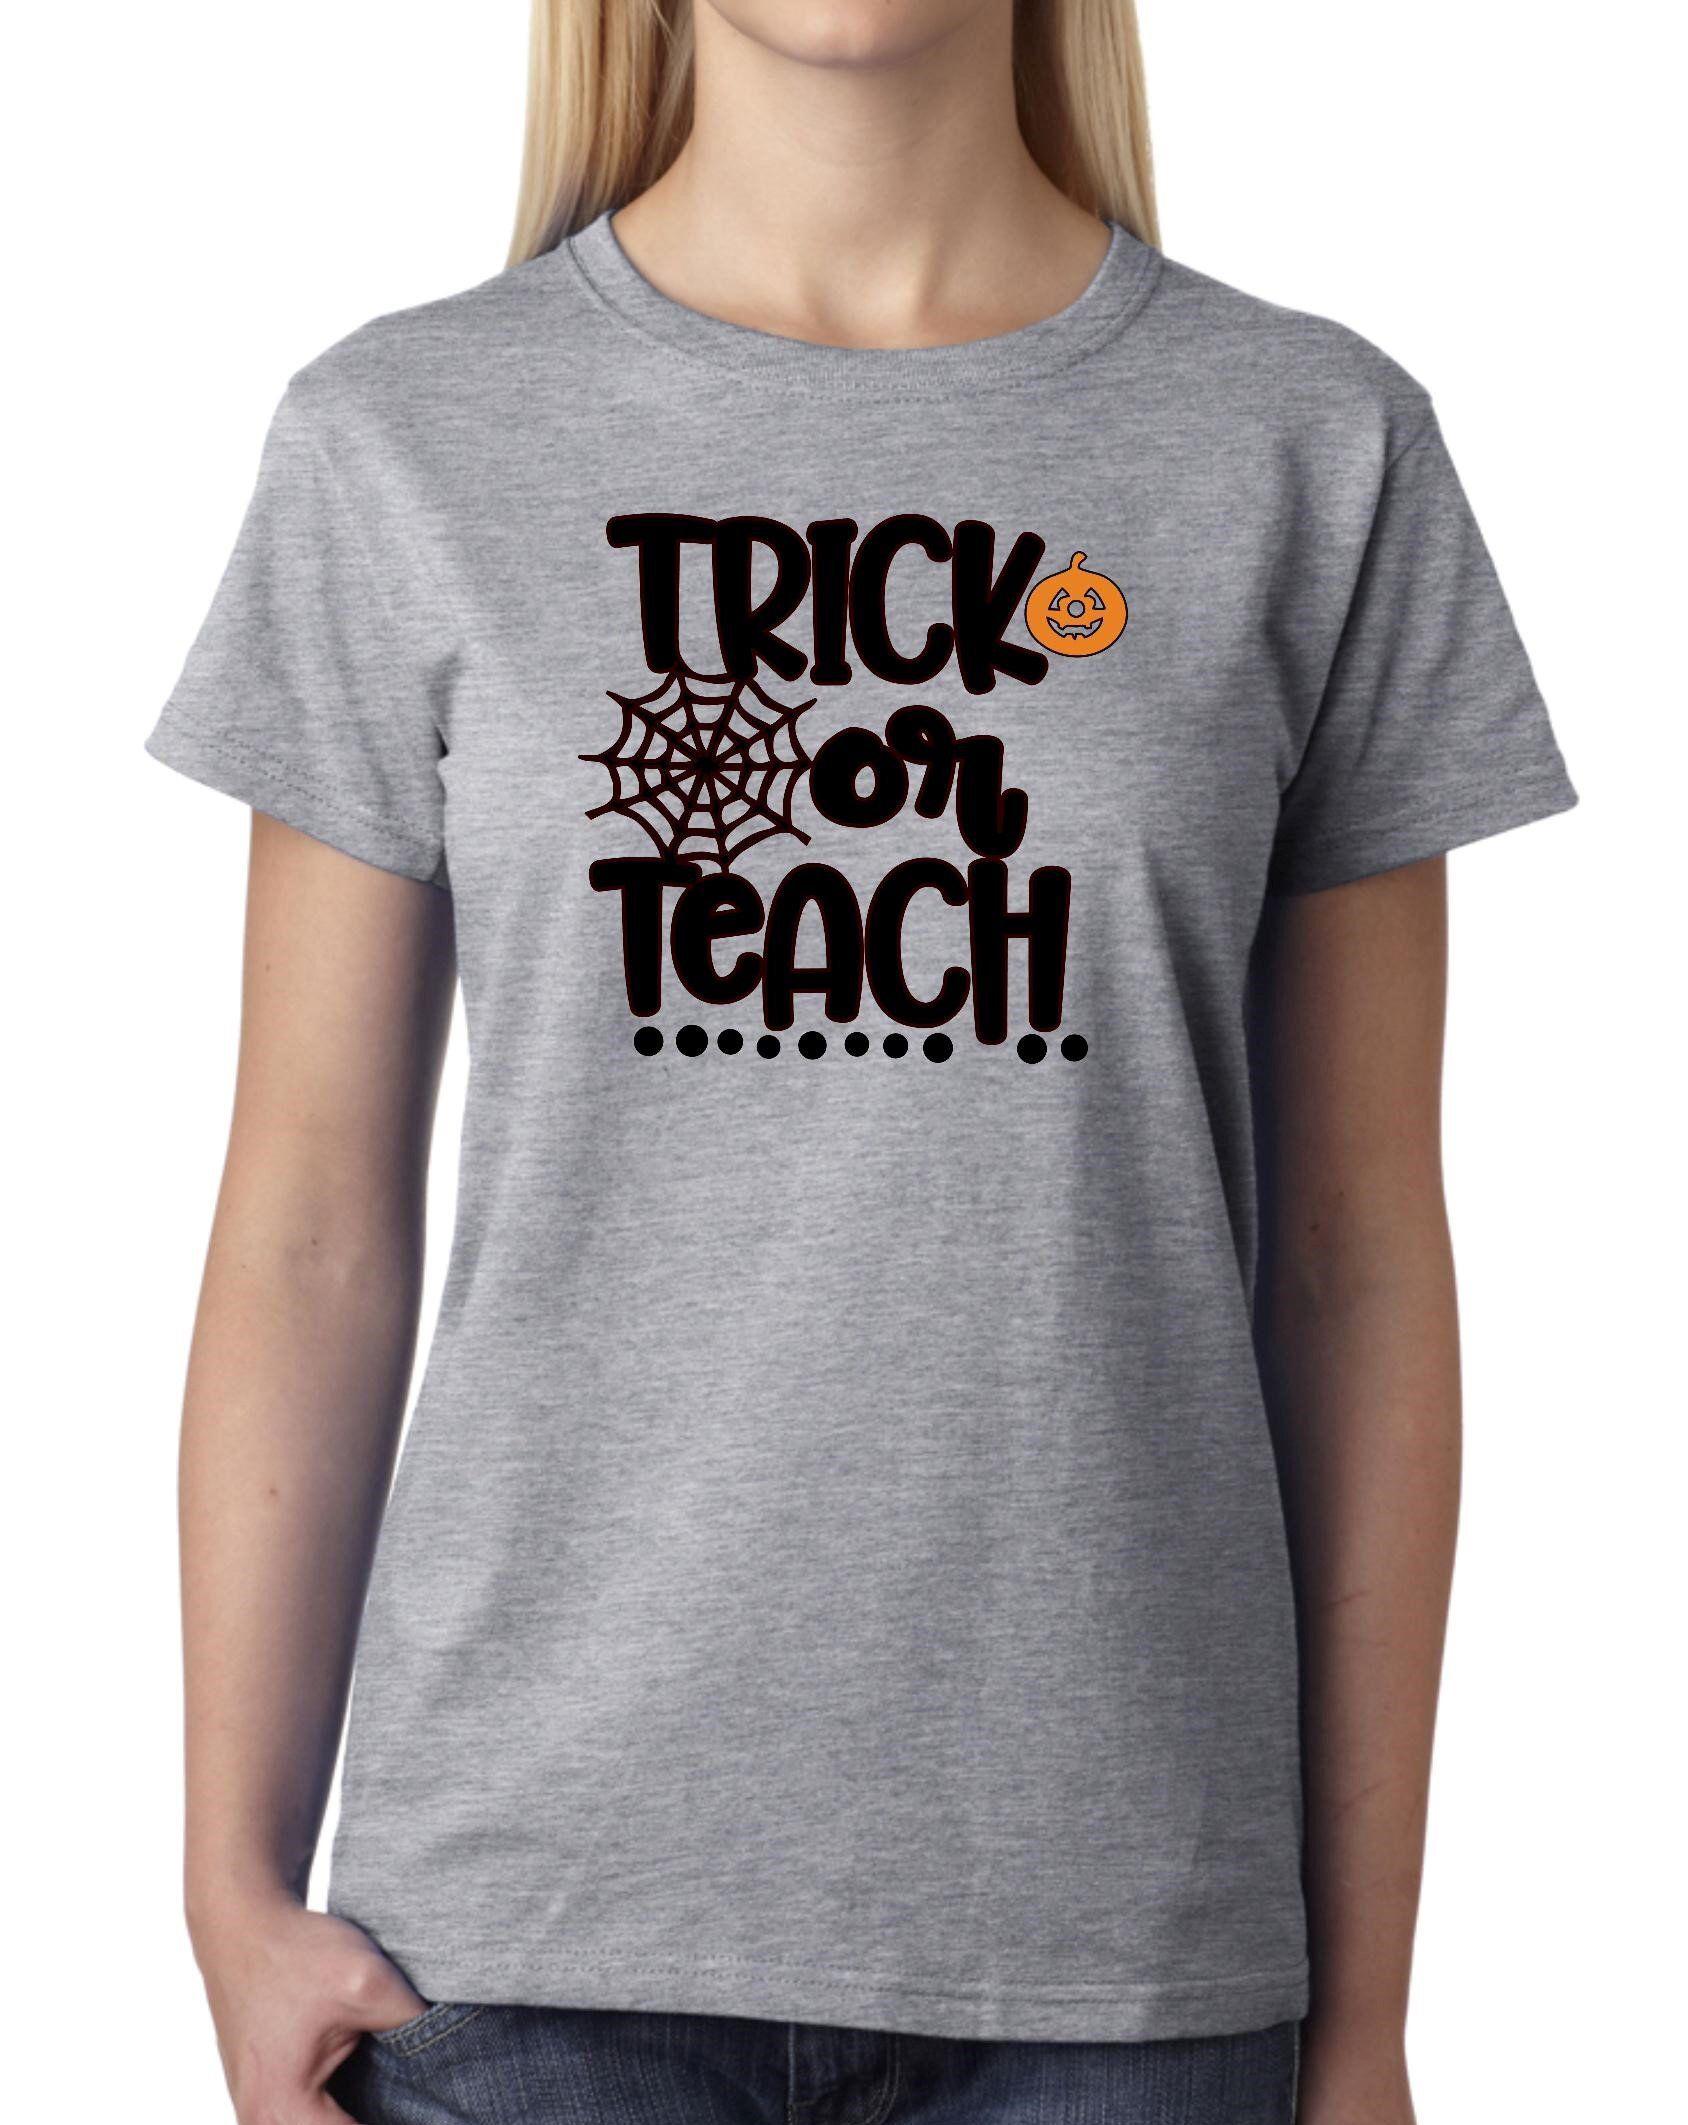 Halloween Men/'s Trick or Treat Shirts Tops T-shirts for Men Bats